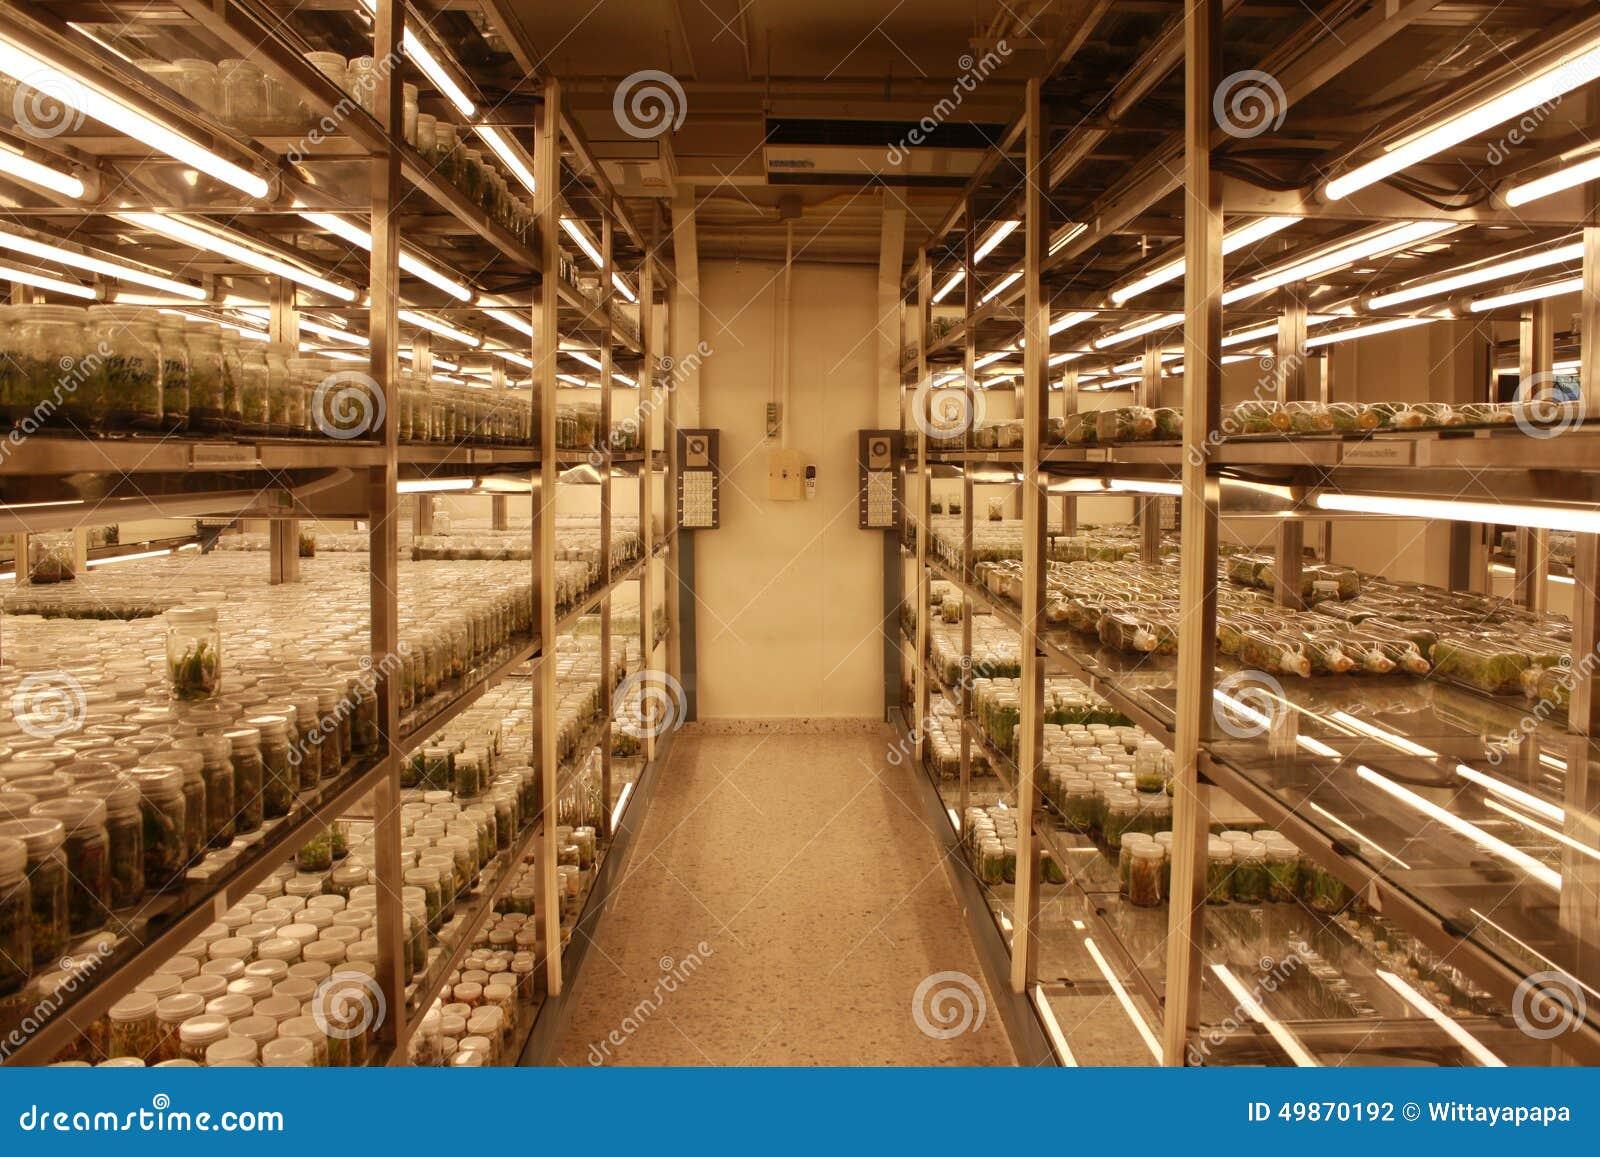 Plant Tissue Culture Room Stock Photo Image 49870192